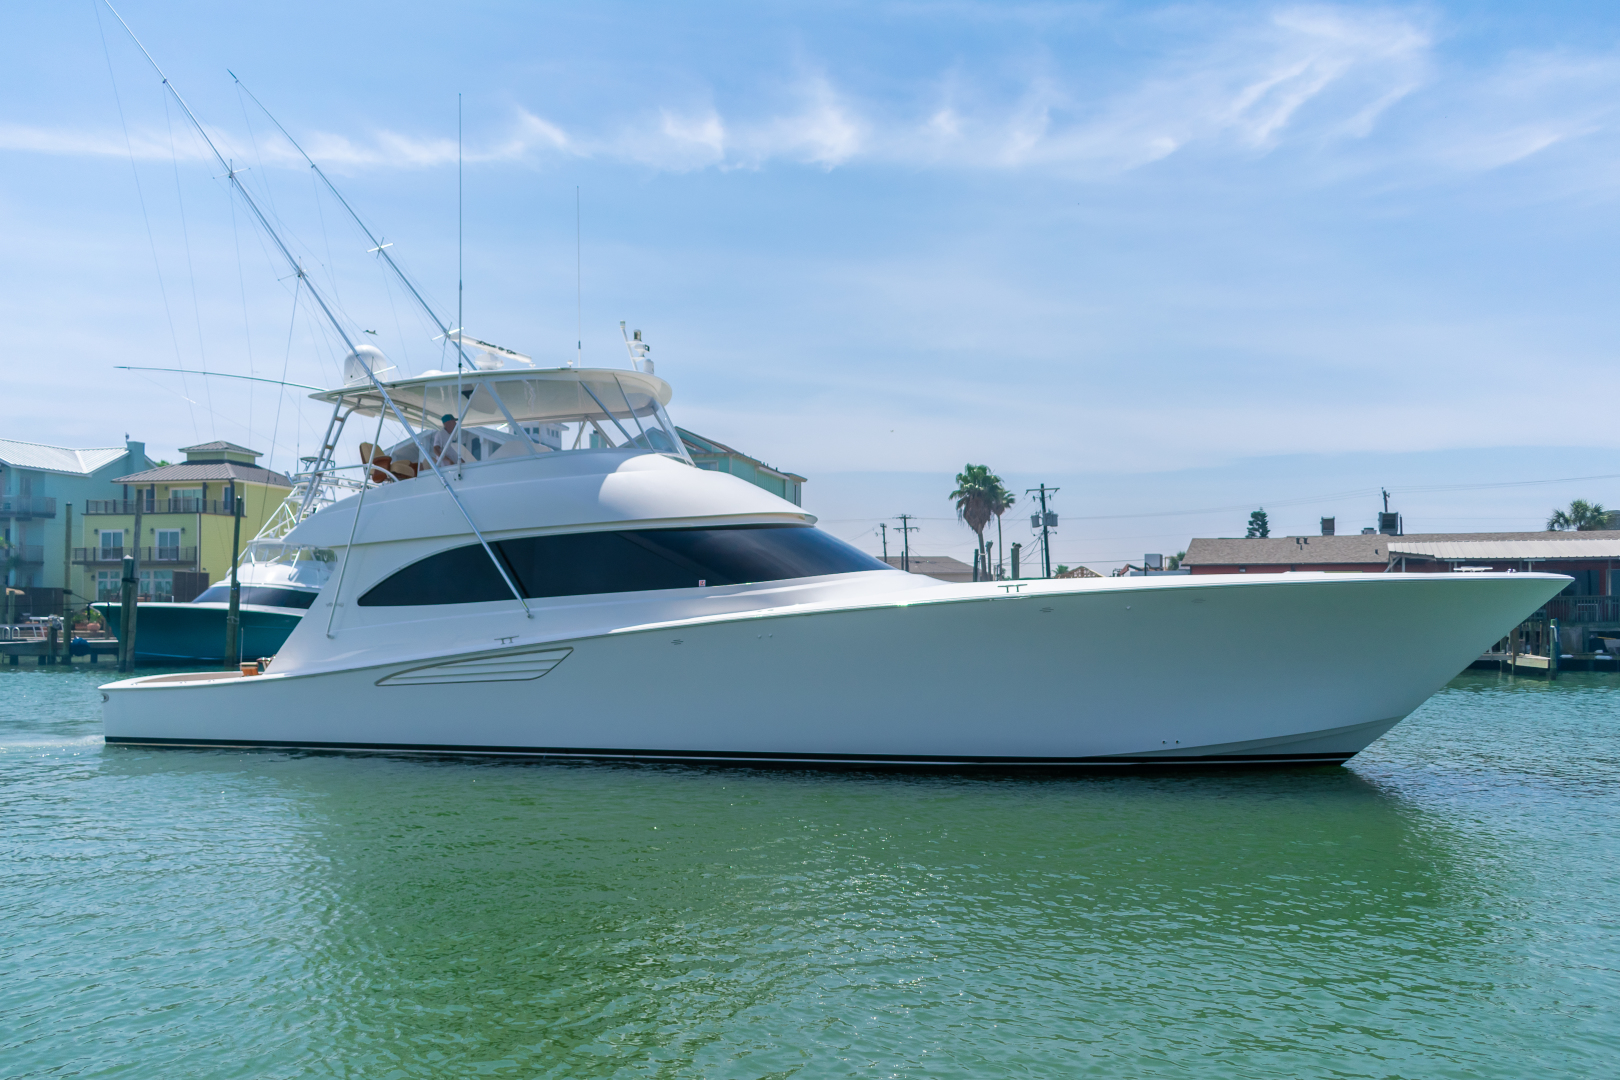 Viking-70 Convertible 2014-Load N Go Port Aransas-Texas-United States-2014 70 Viking Load N Go Starboard (1)-1380603 | Thumbnail